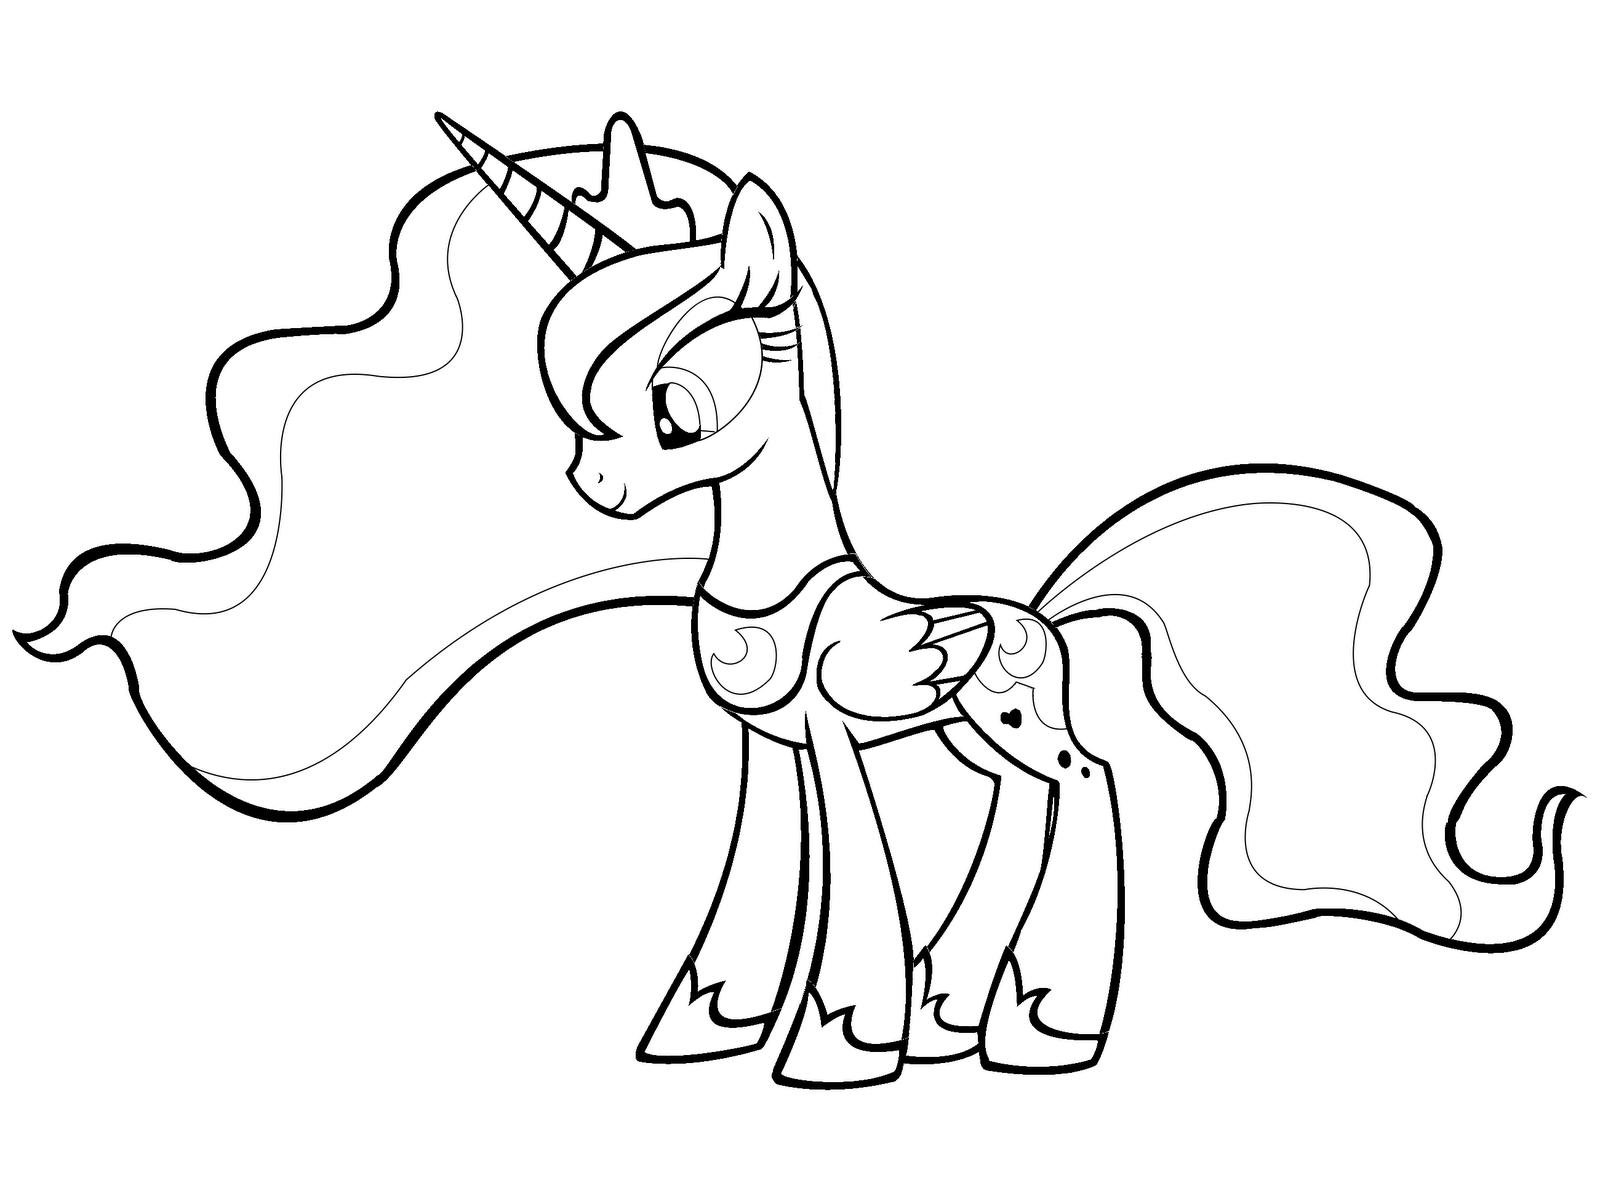 Coloring Fun!: Princess Luna